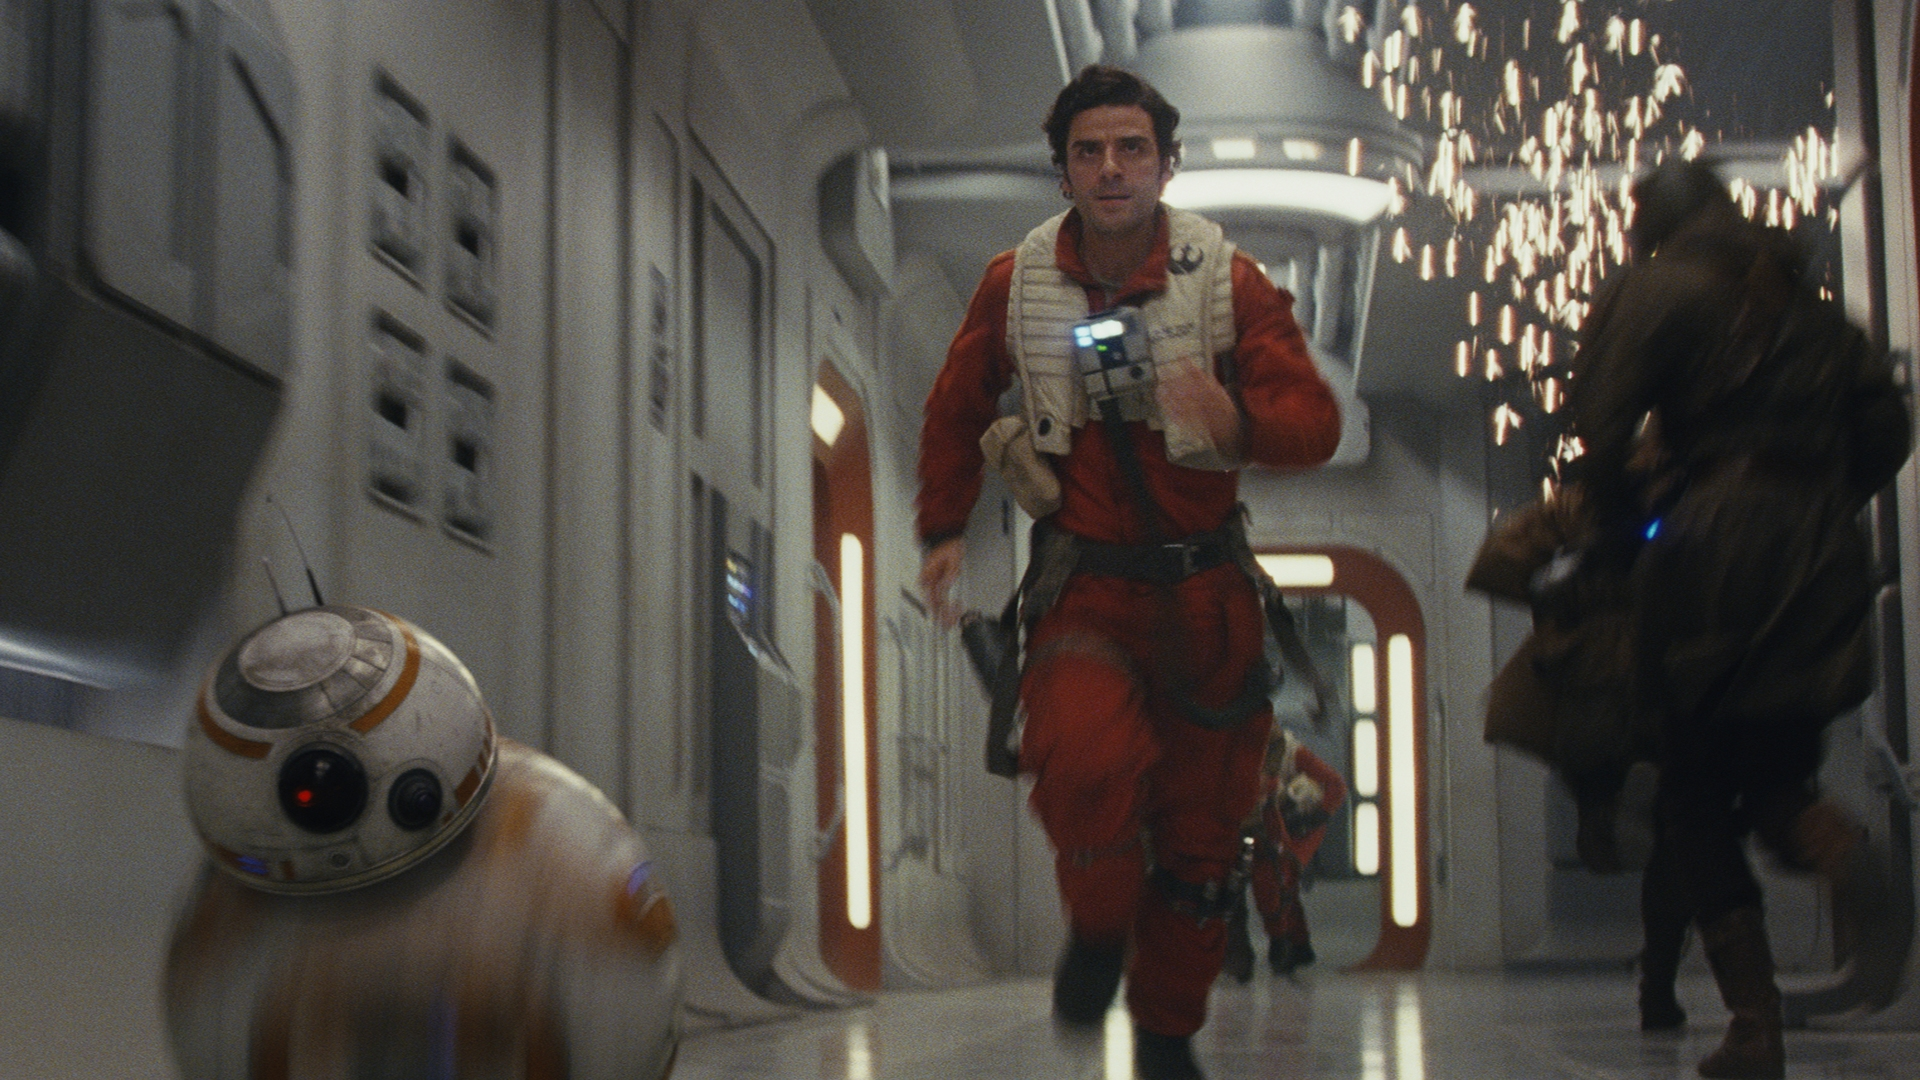 Bb 8 Oscar Isaac Poe Dameron Robot Star Wars Star Wars The Last Jedi 1920x1080